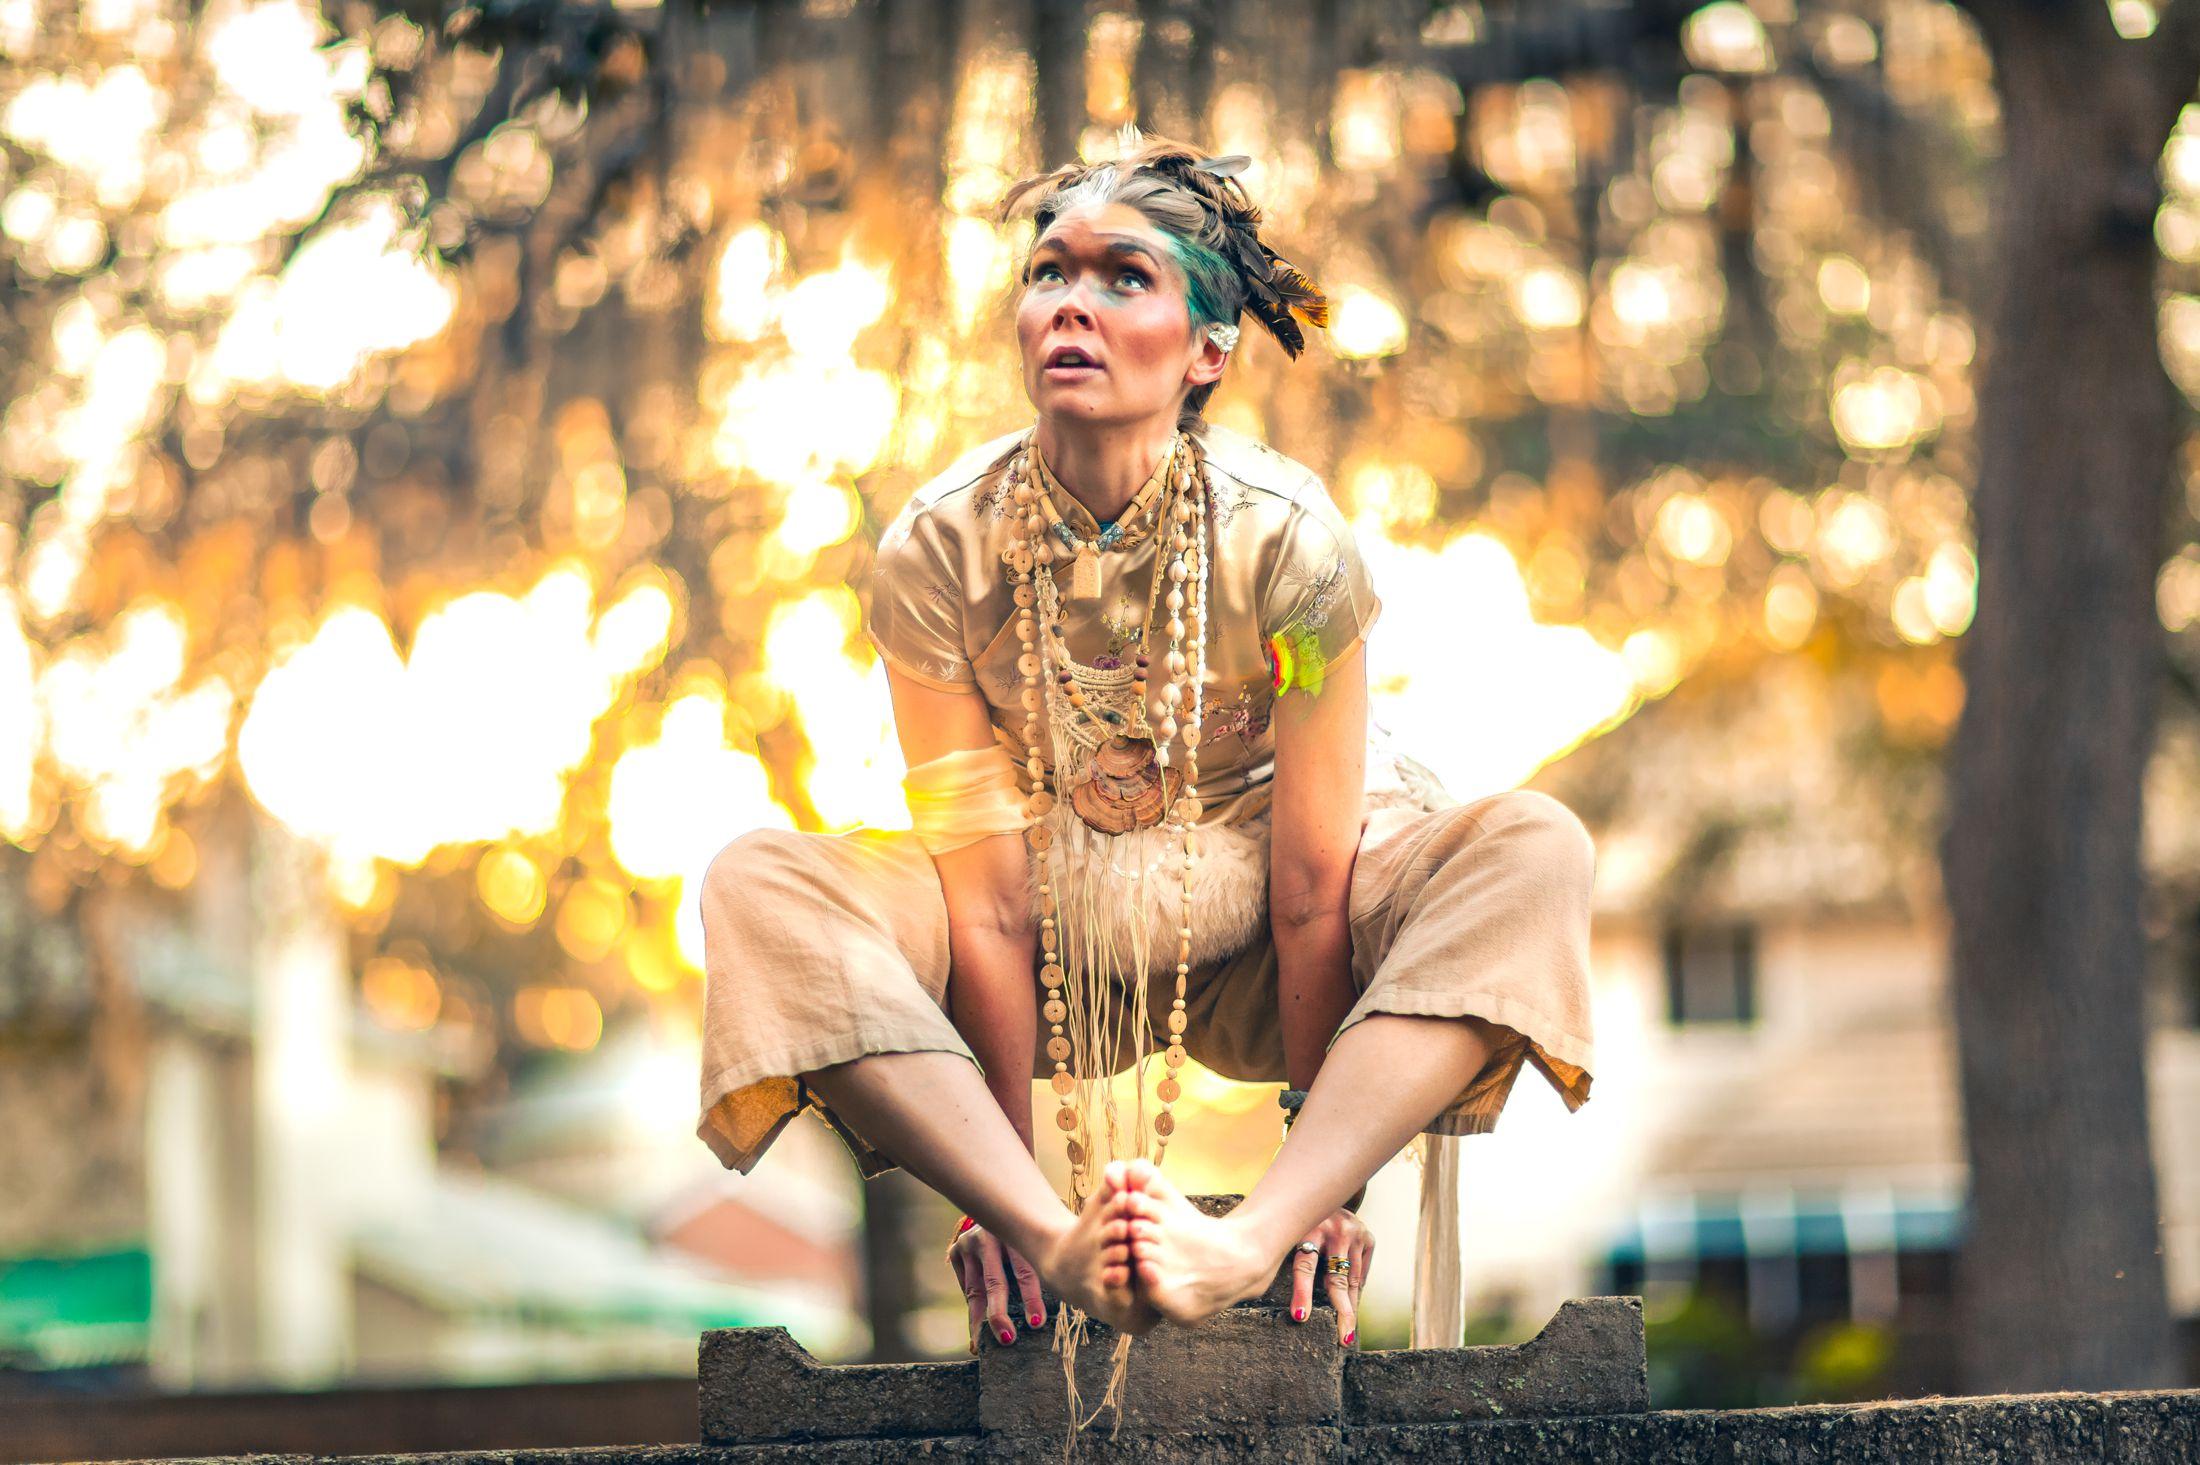 Electric Forest yoga LED light nomad festival style ethnic global fashion shoot warpaint tribal 15.jpg